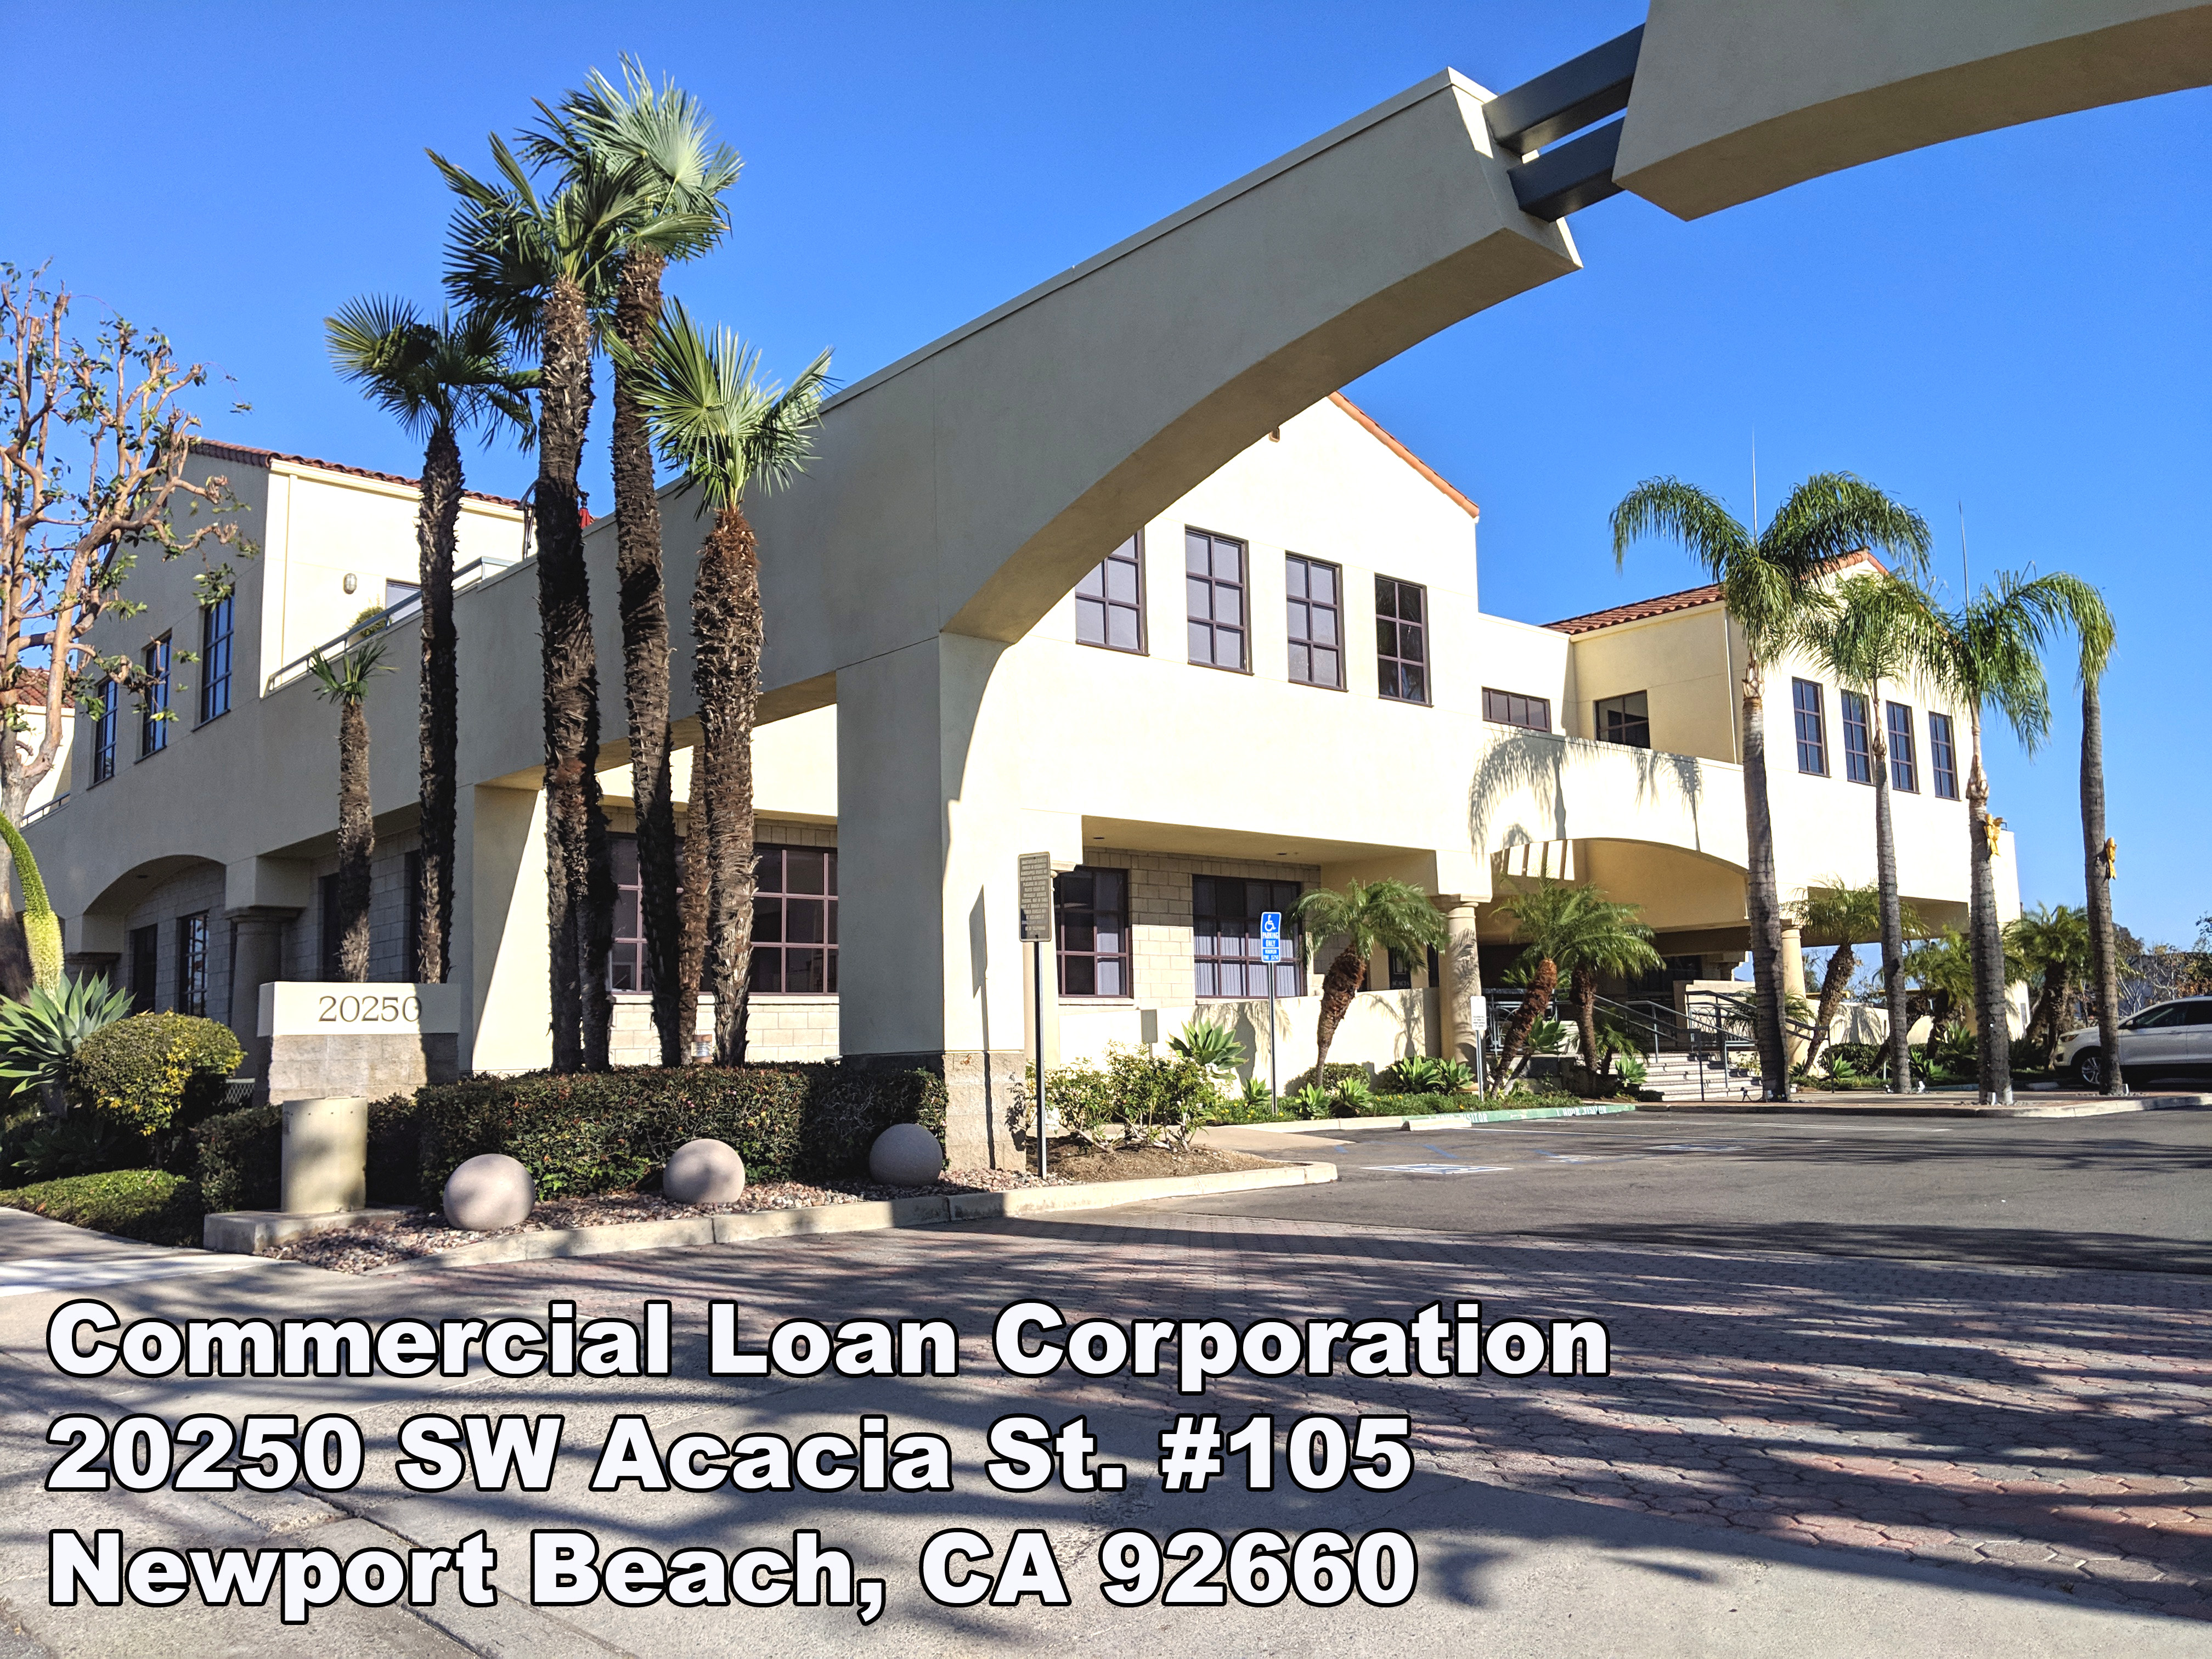 20250 SW Acacia St. #105, Newport Beach CA, 92660